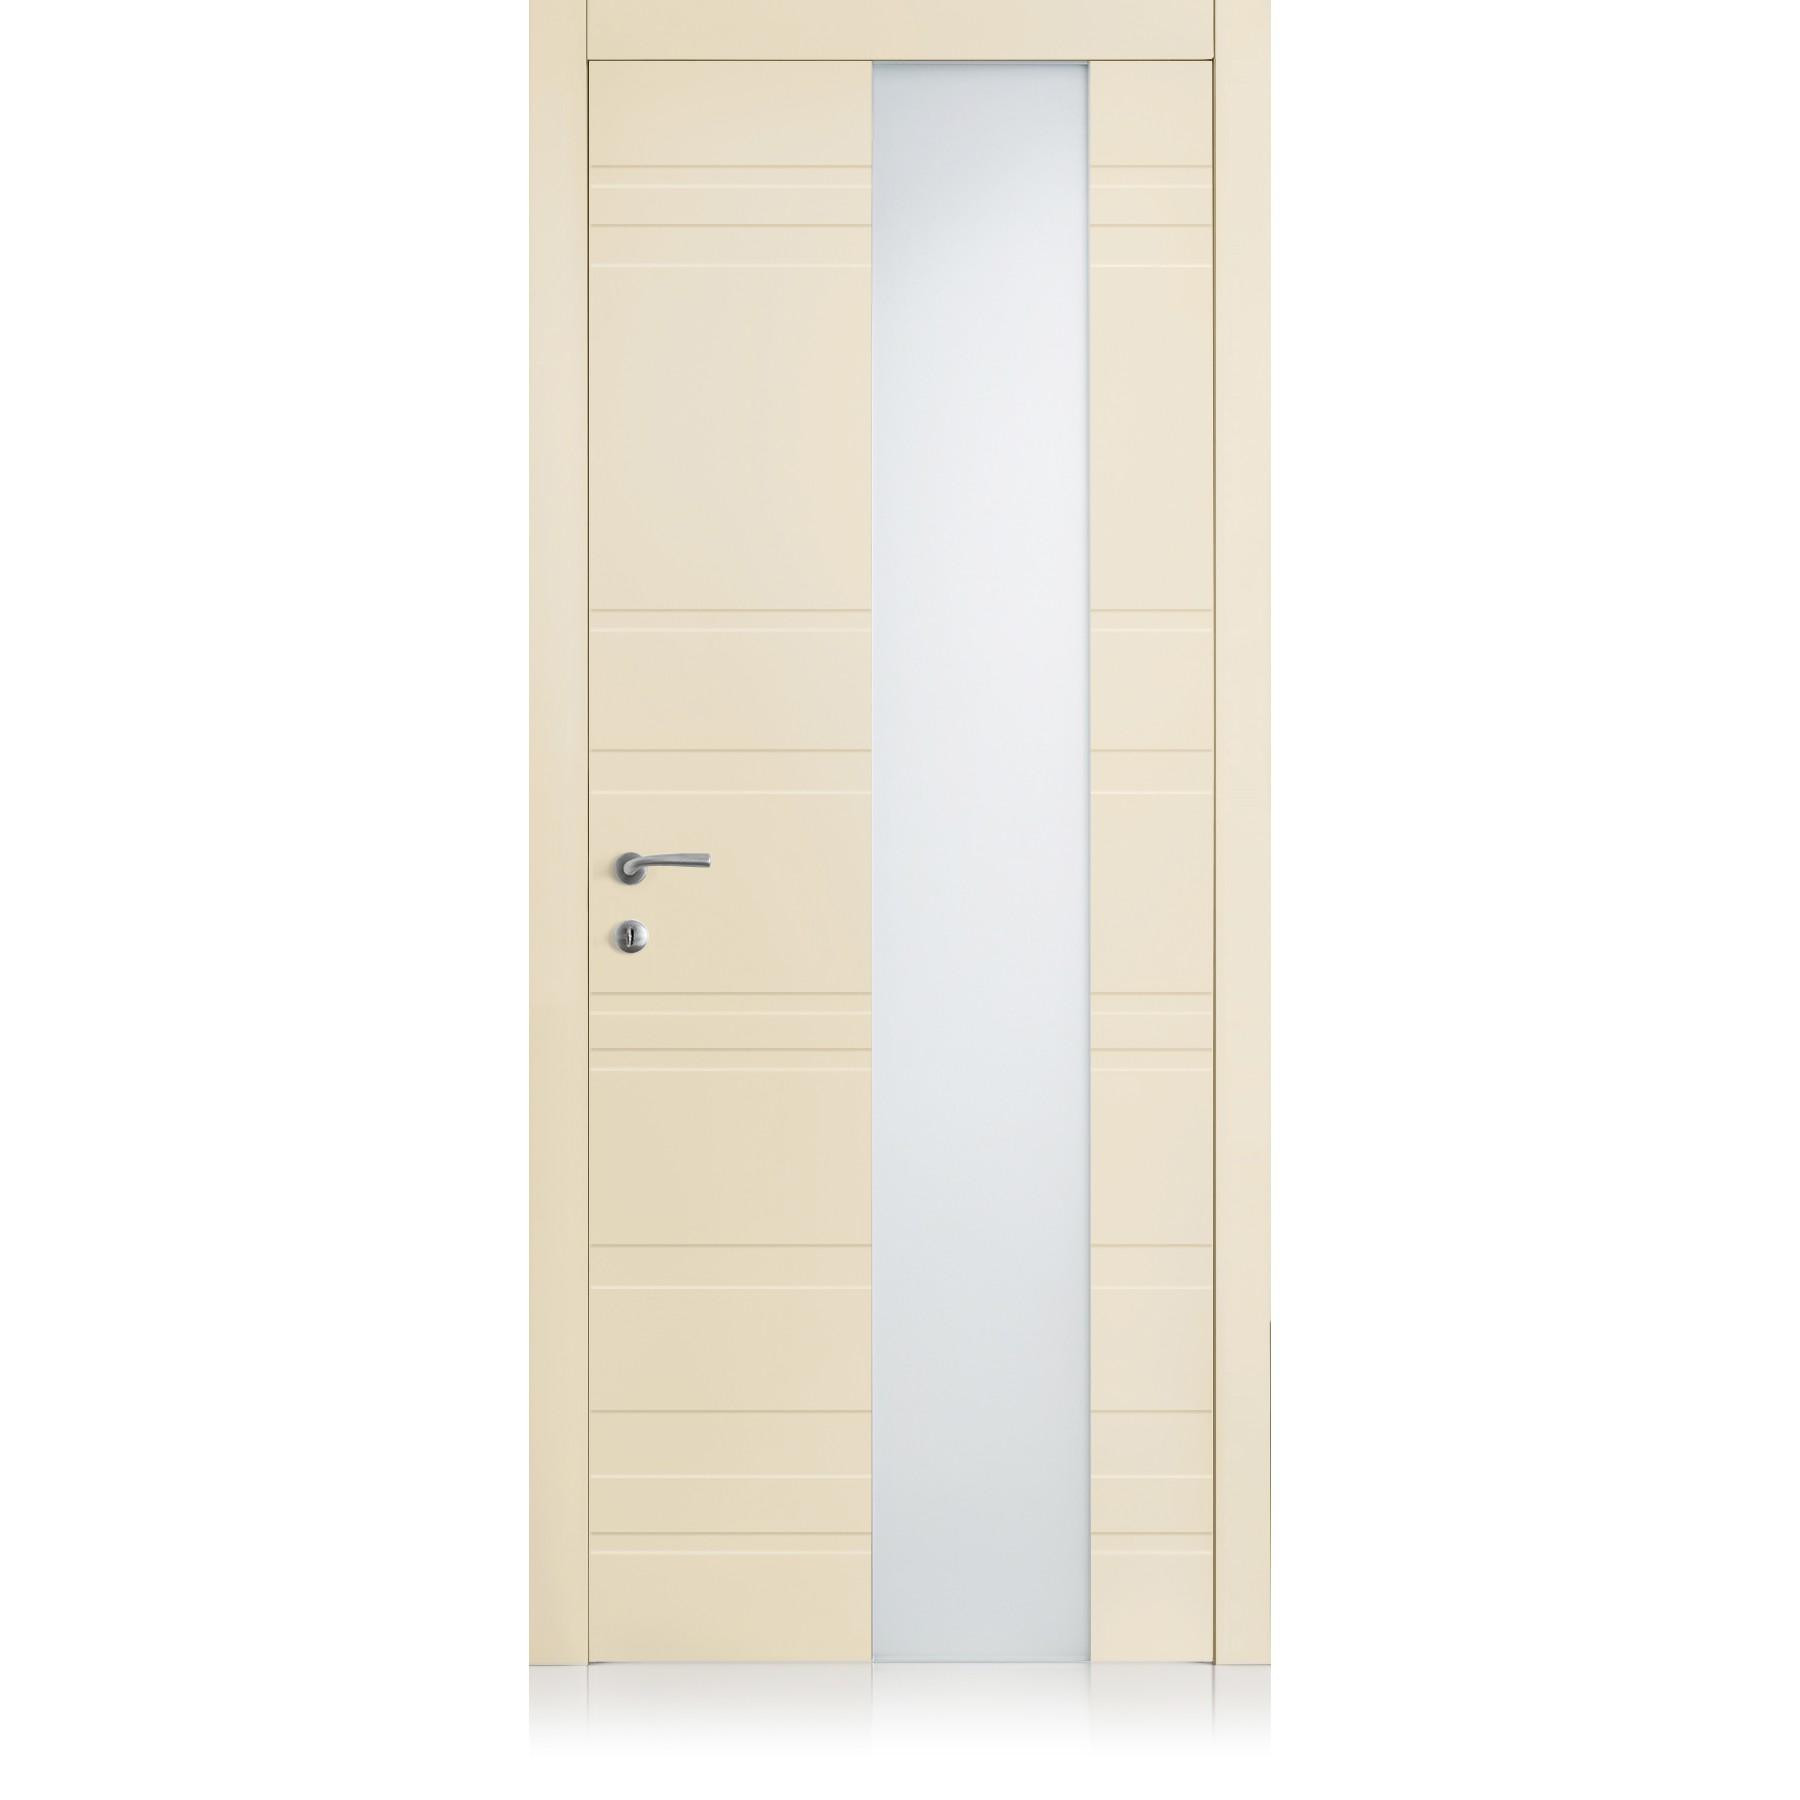 Yncisa Styla Vetro cremy door